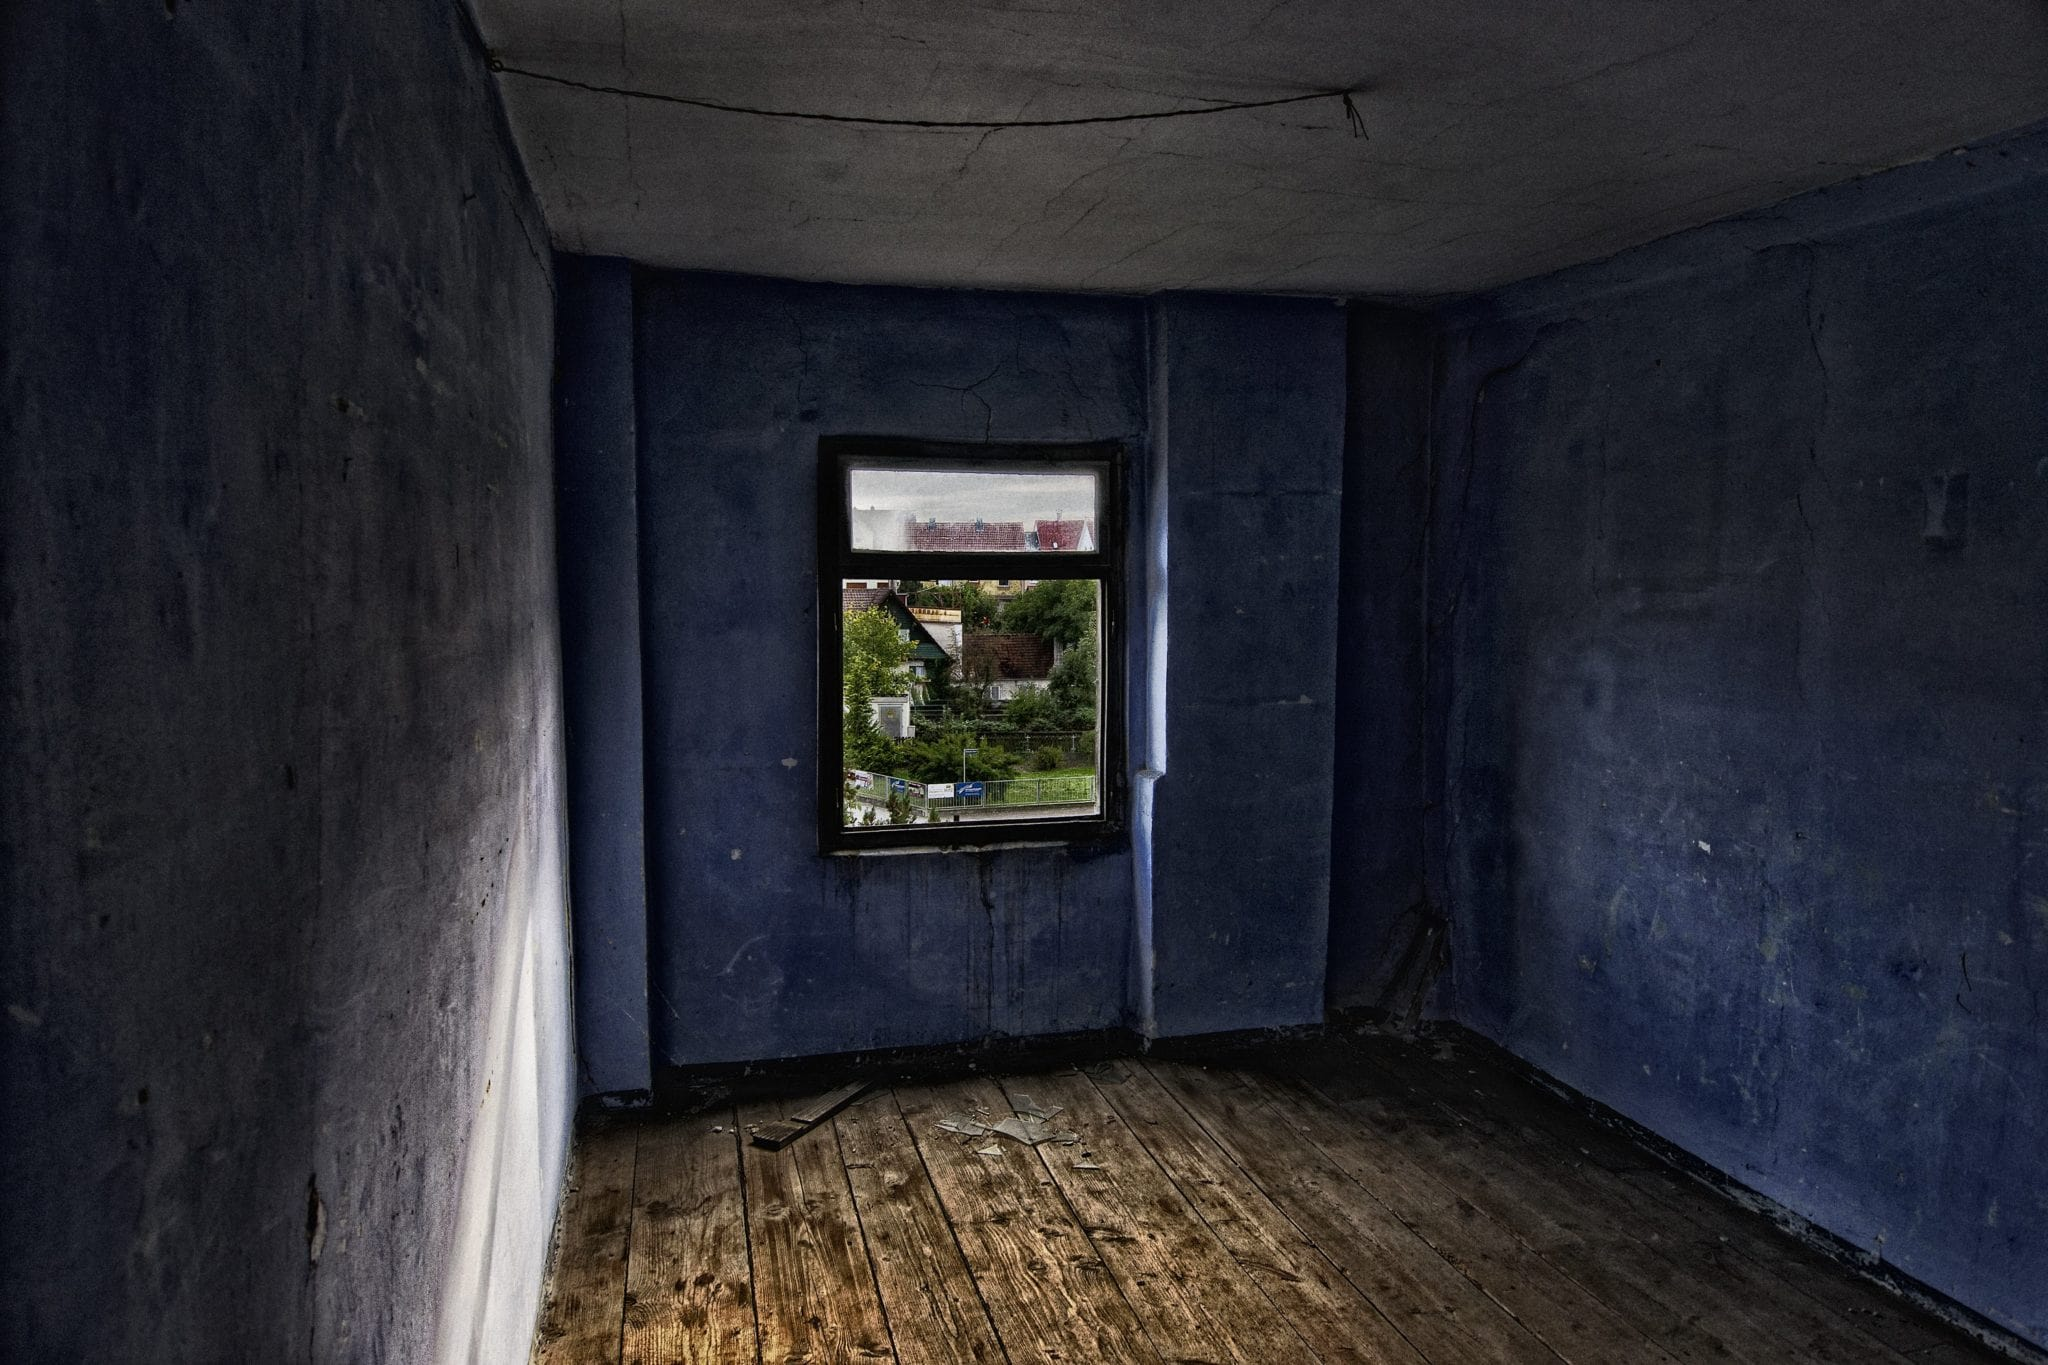 Dunkles Zimmer